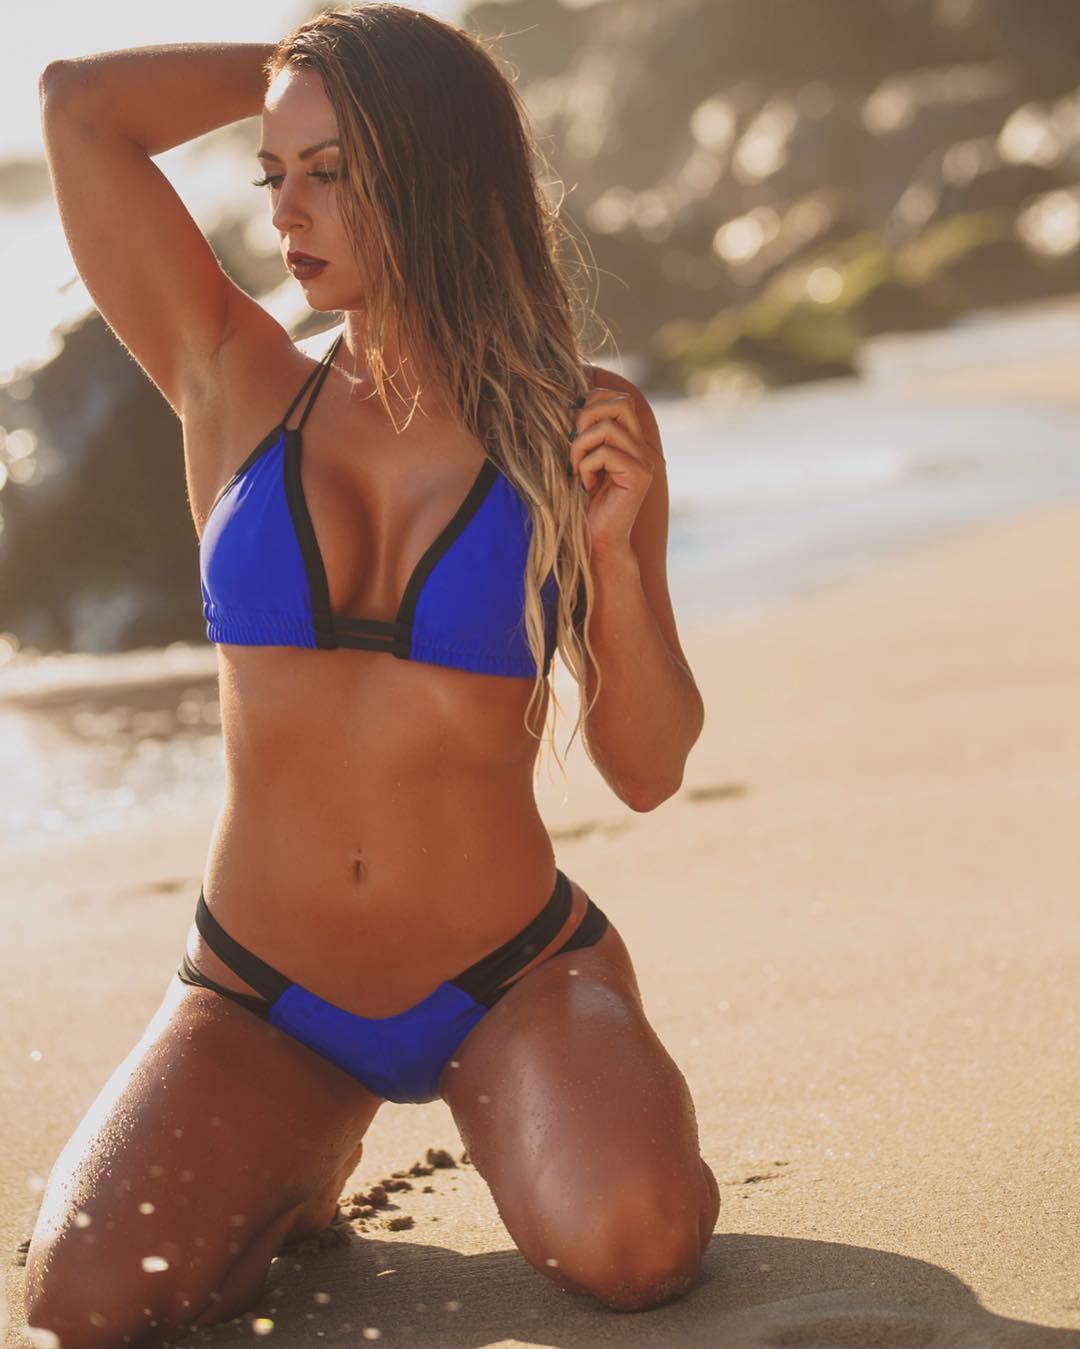 Emma bikini pictures